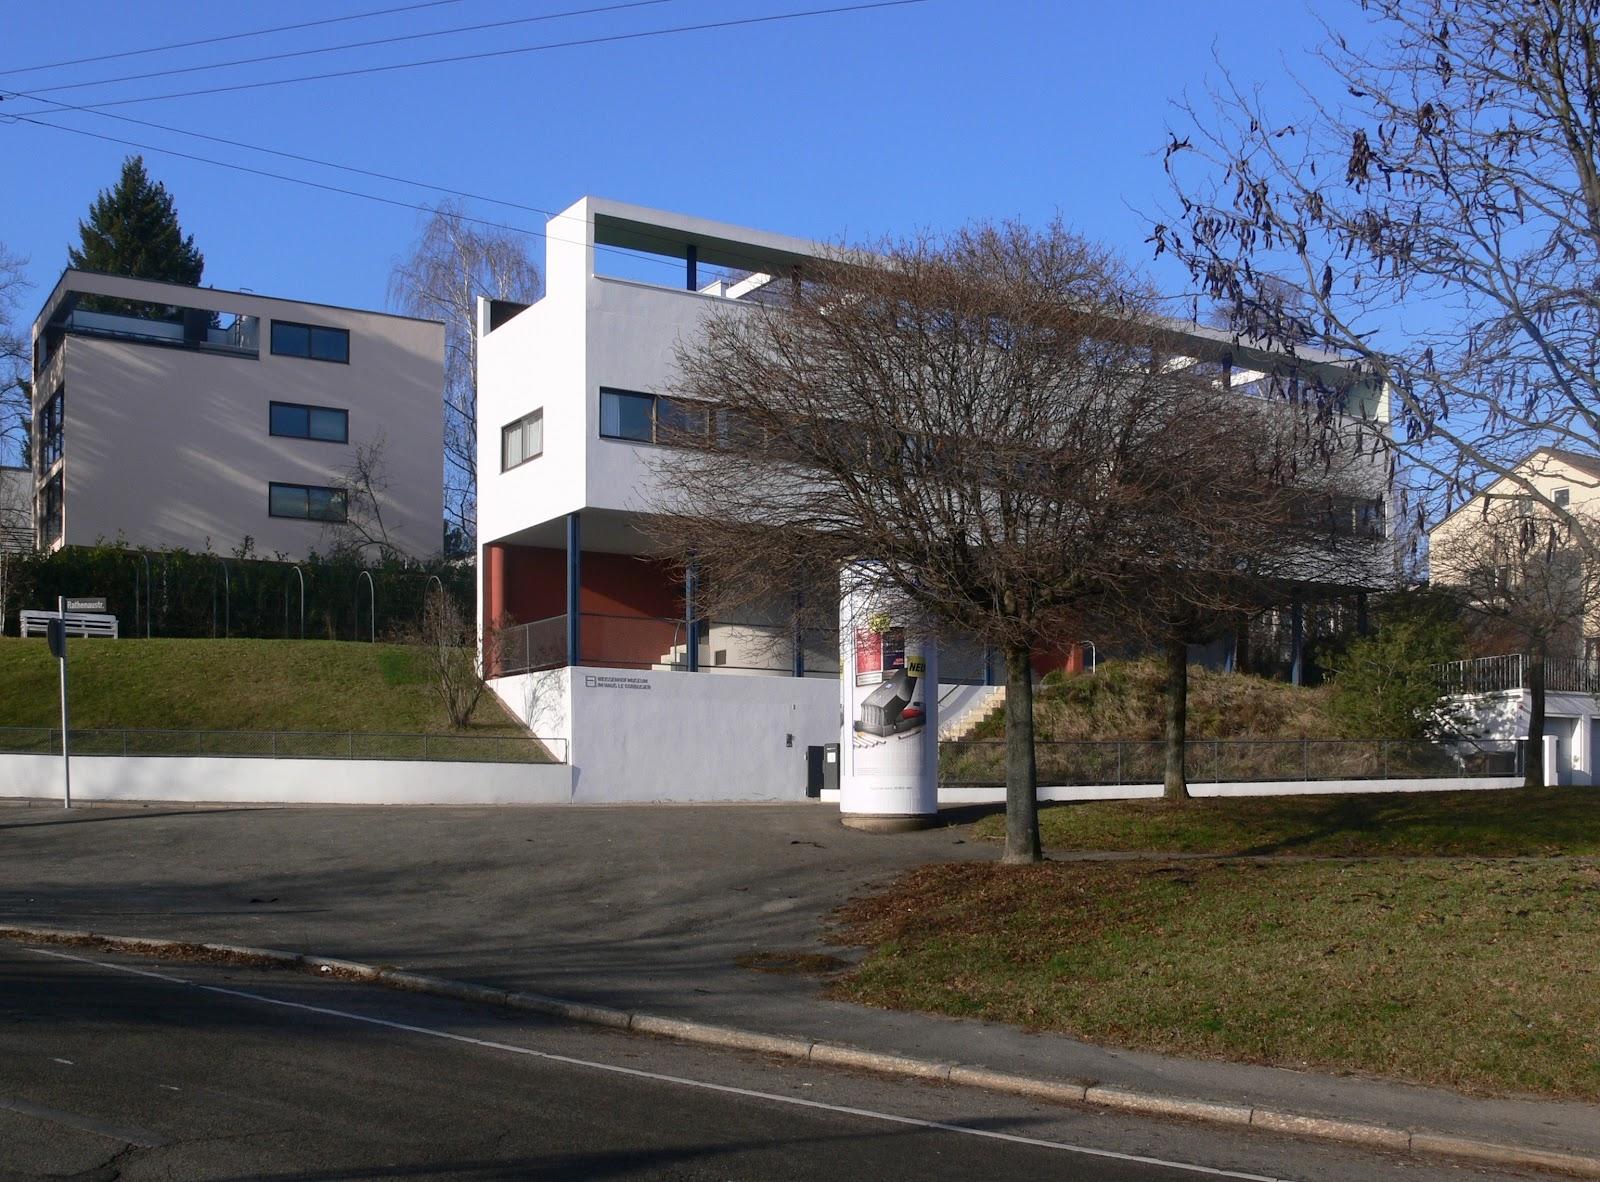 Historia del arte arquitectura racionalista for Villas weissenhofsiedlung